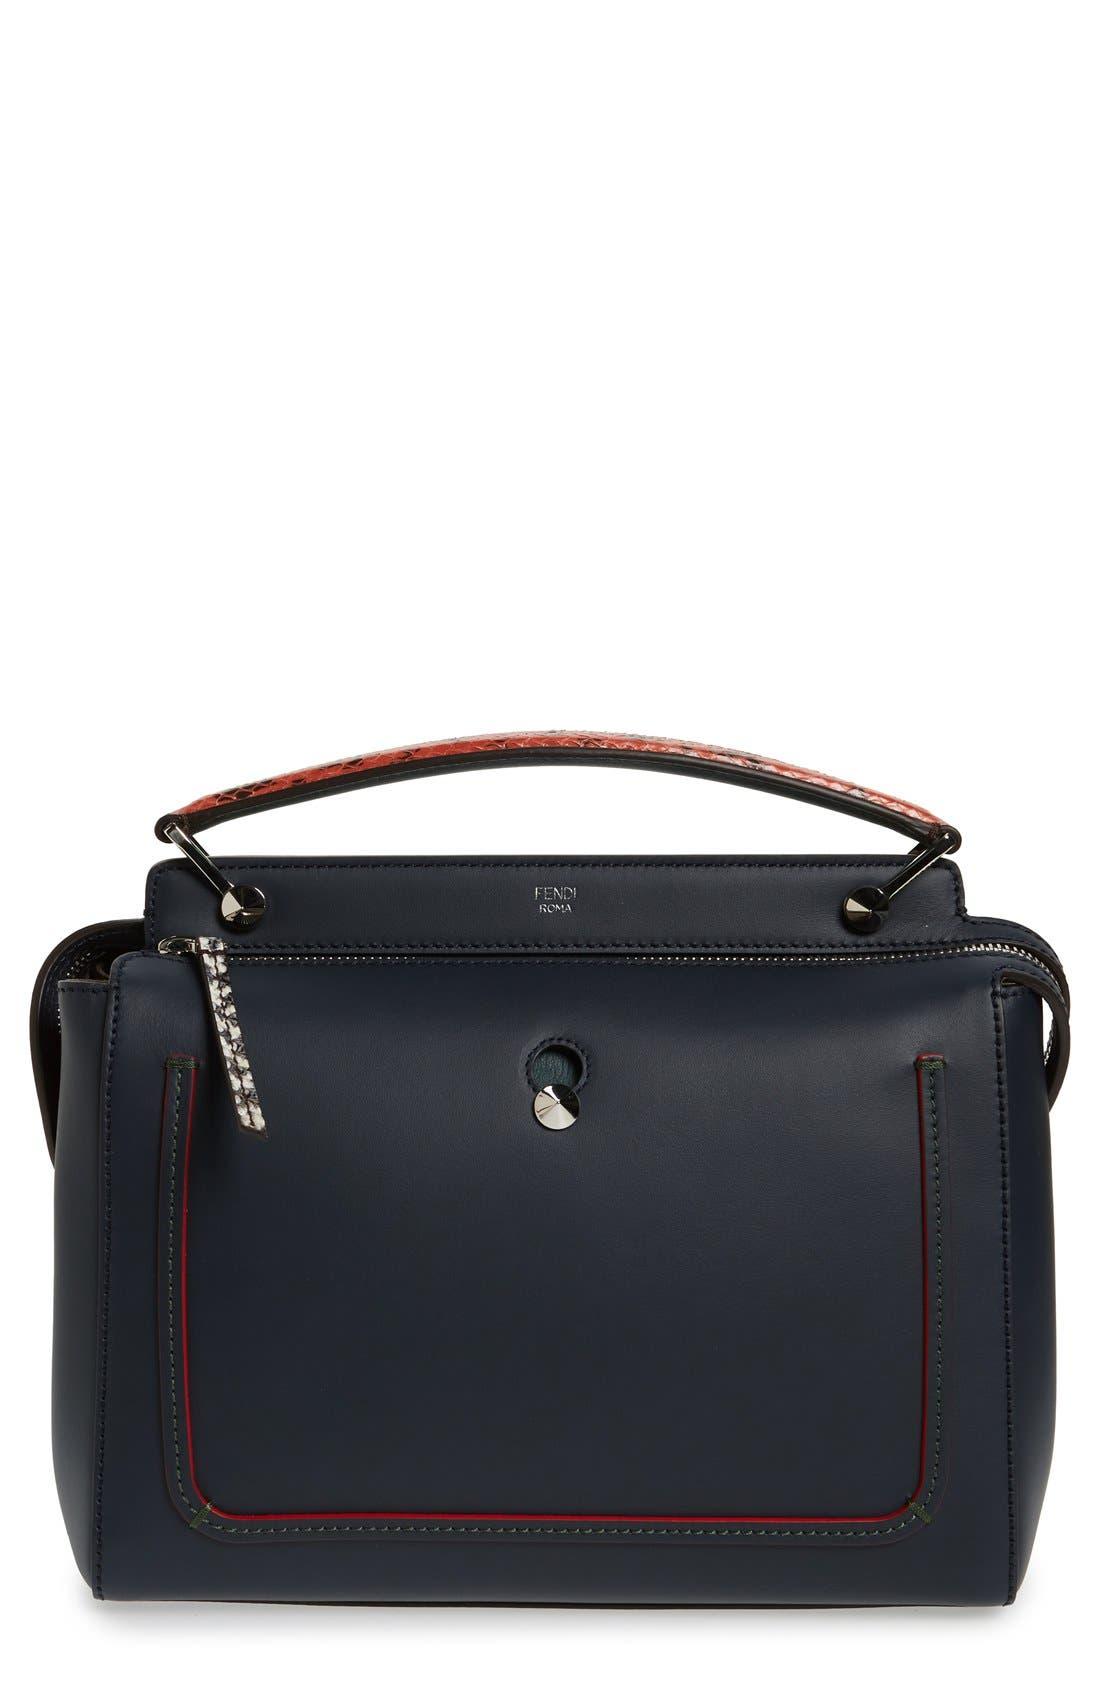 Main Image - Fendi 'DOTCOM' Leather & Genuine Snakeskin Satchel